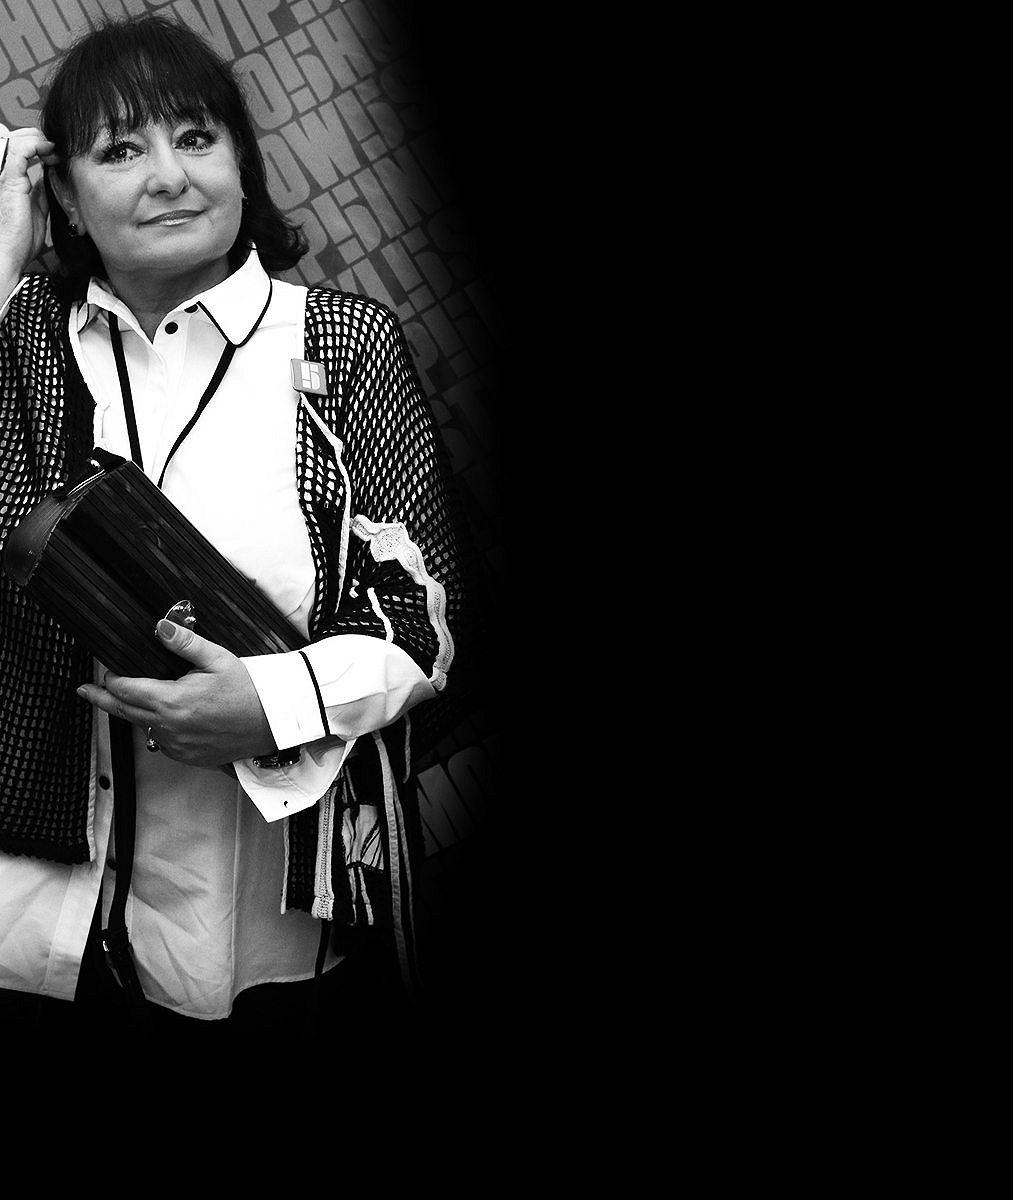 Zdrceného manžela Evy Jurinové (✝67) rozhořčily nepravdy o smrti jeho ženy: Pořád mám právo ji chránit